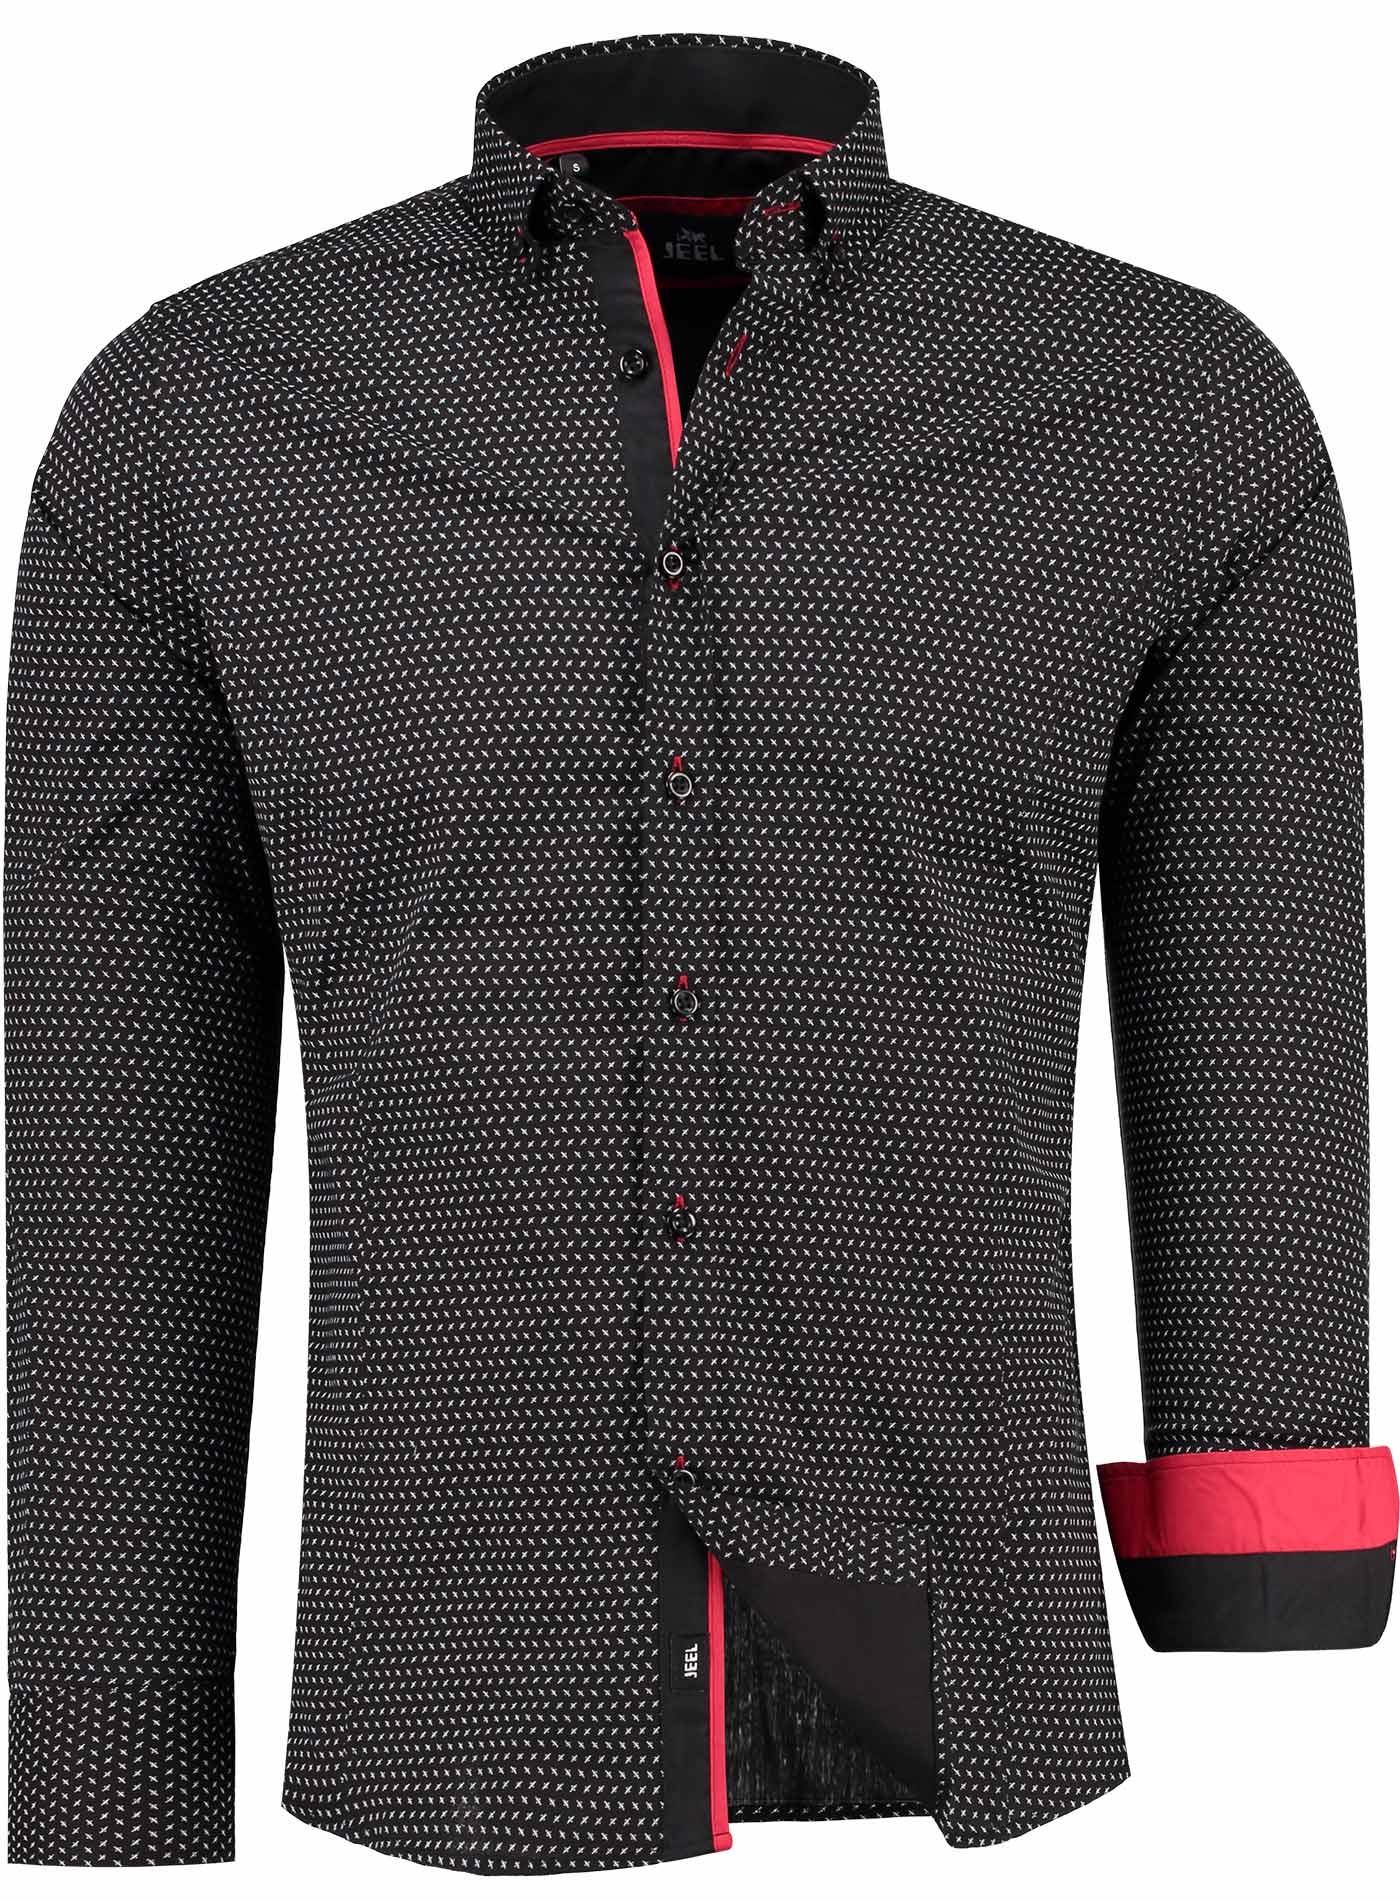 Overhemd Zwart